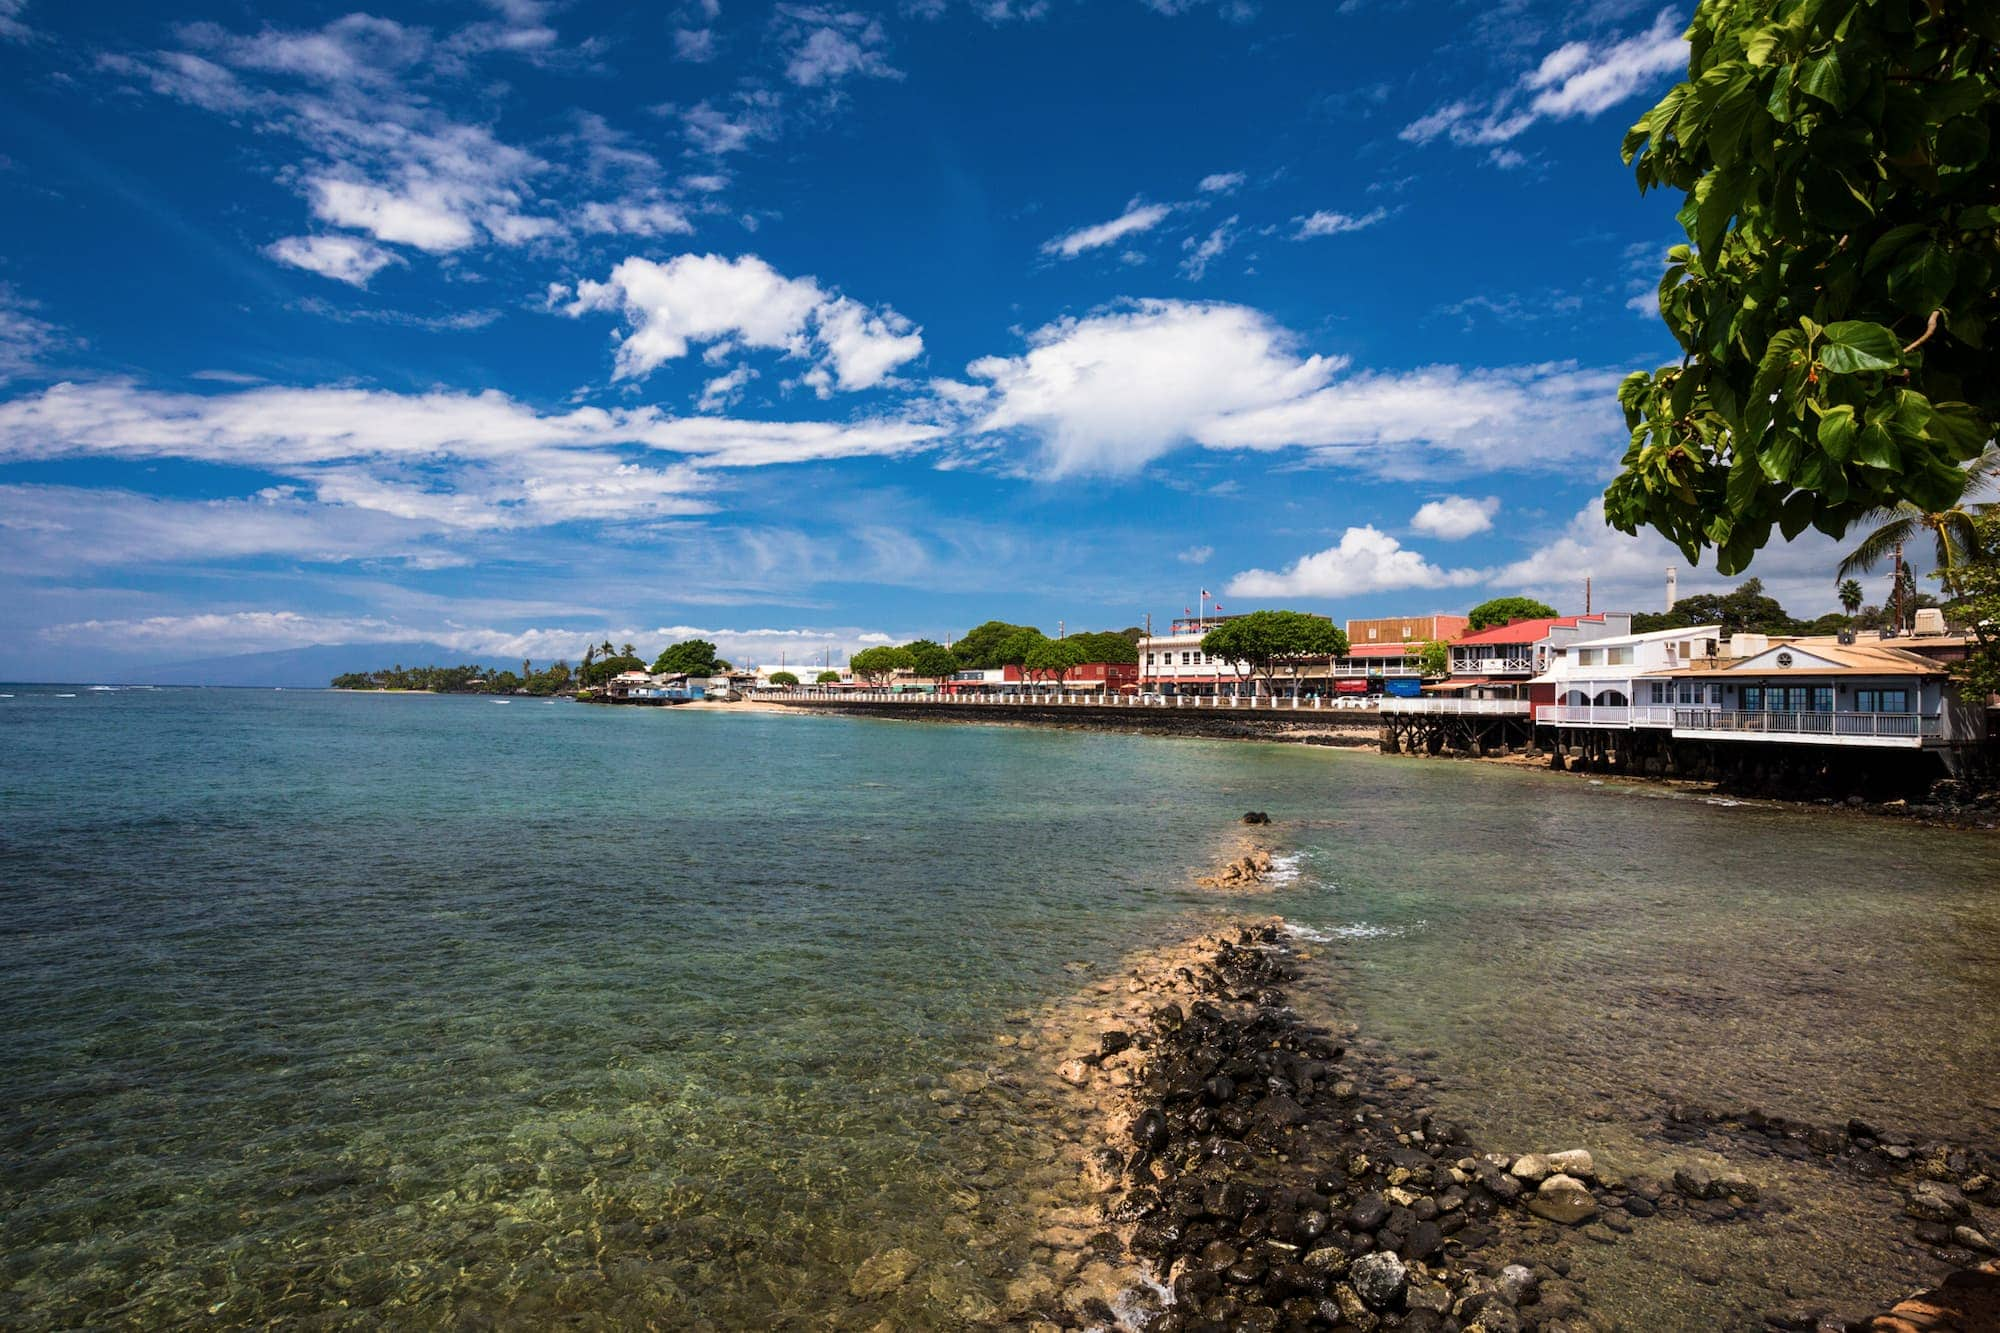 Where to stay on Maui